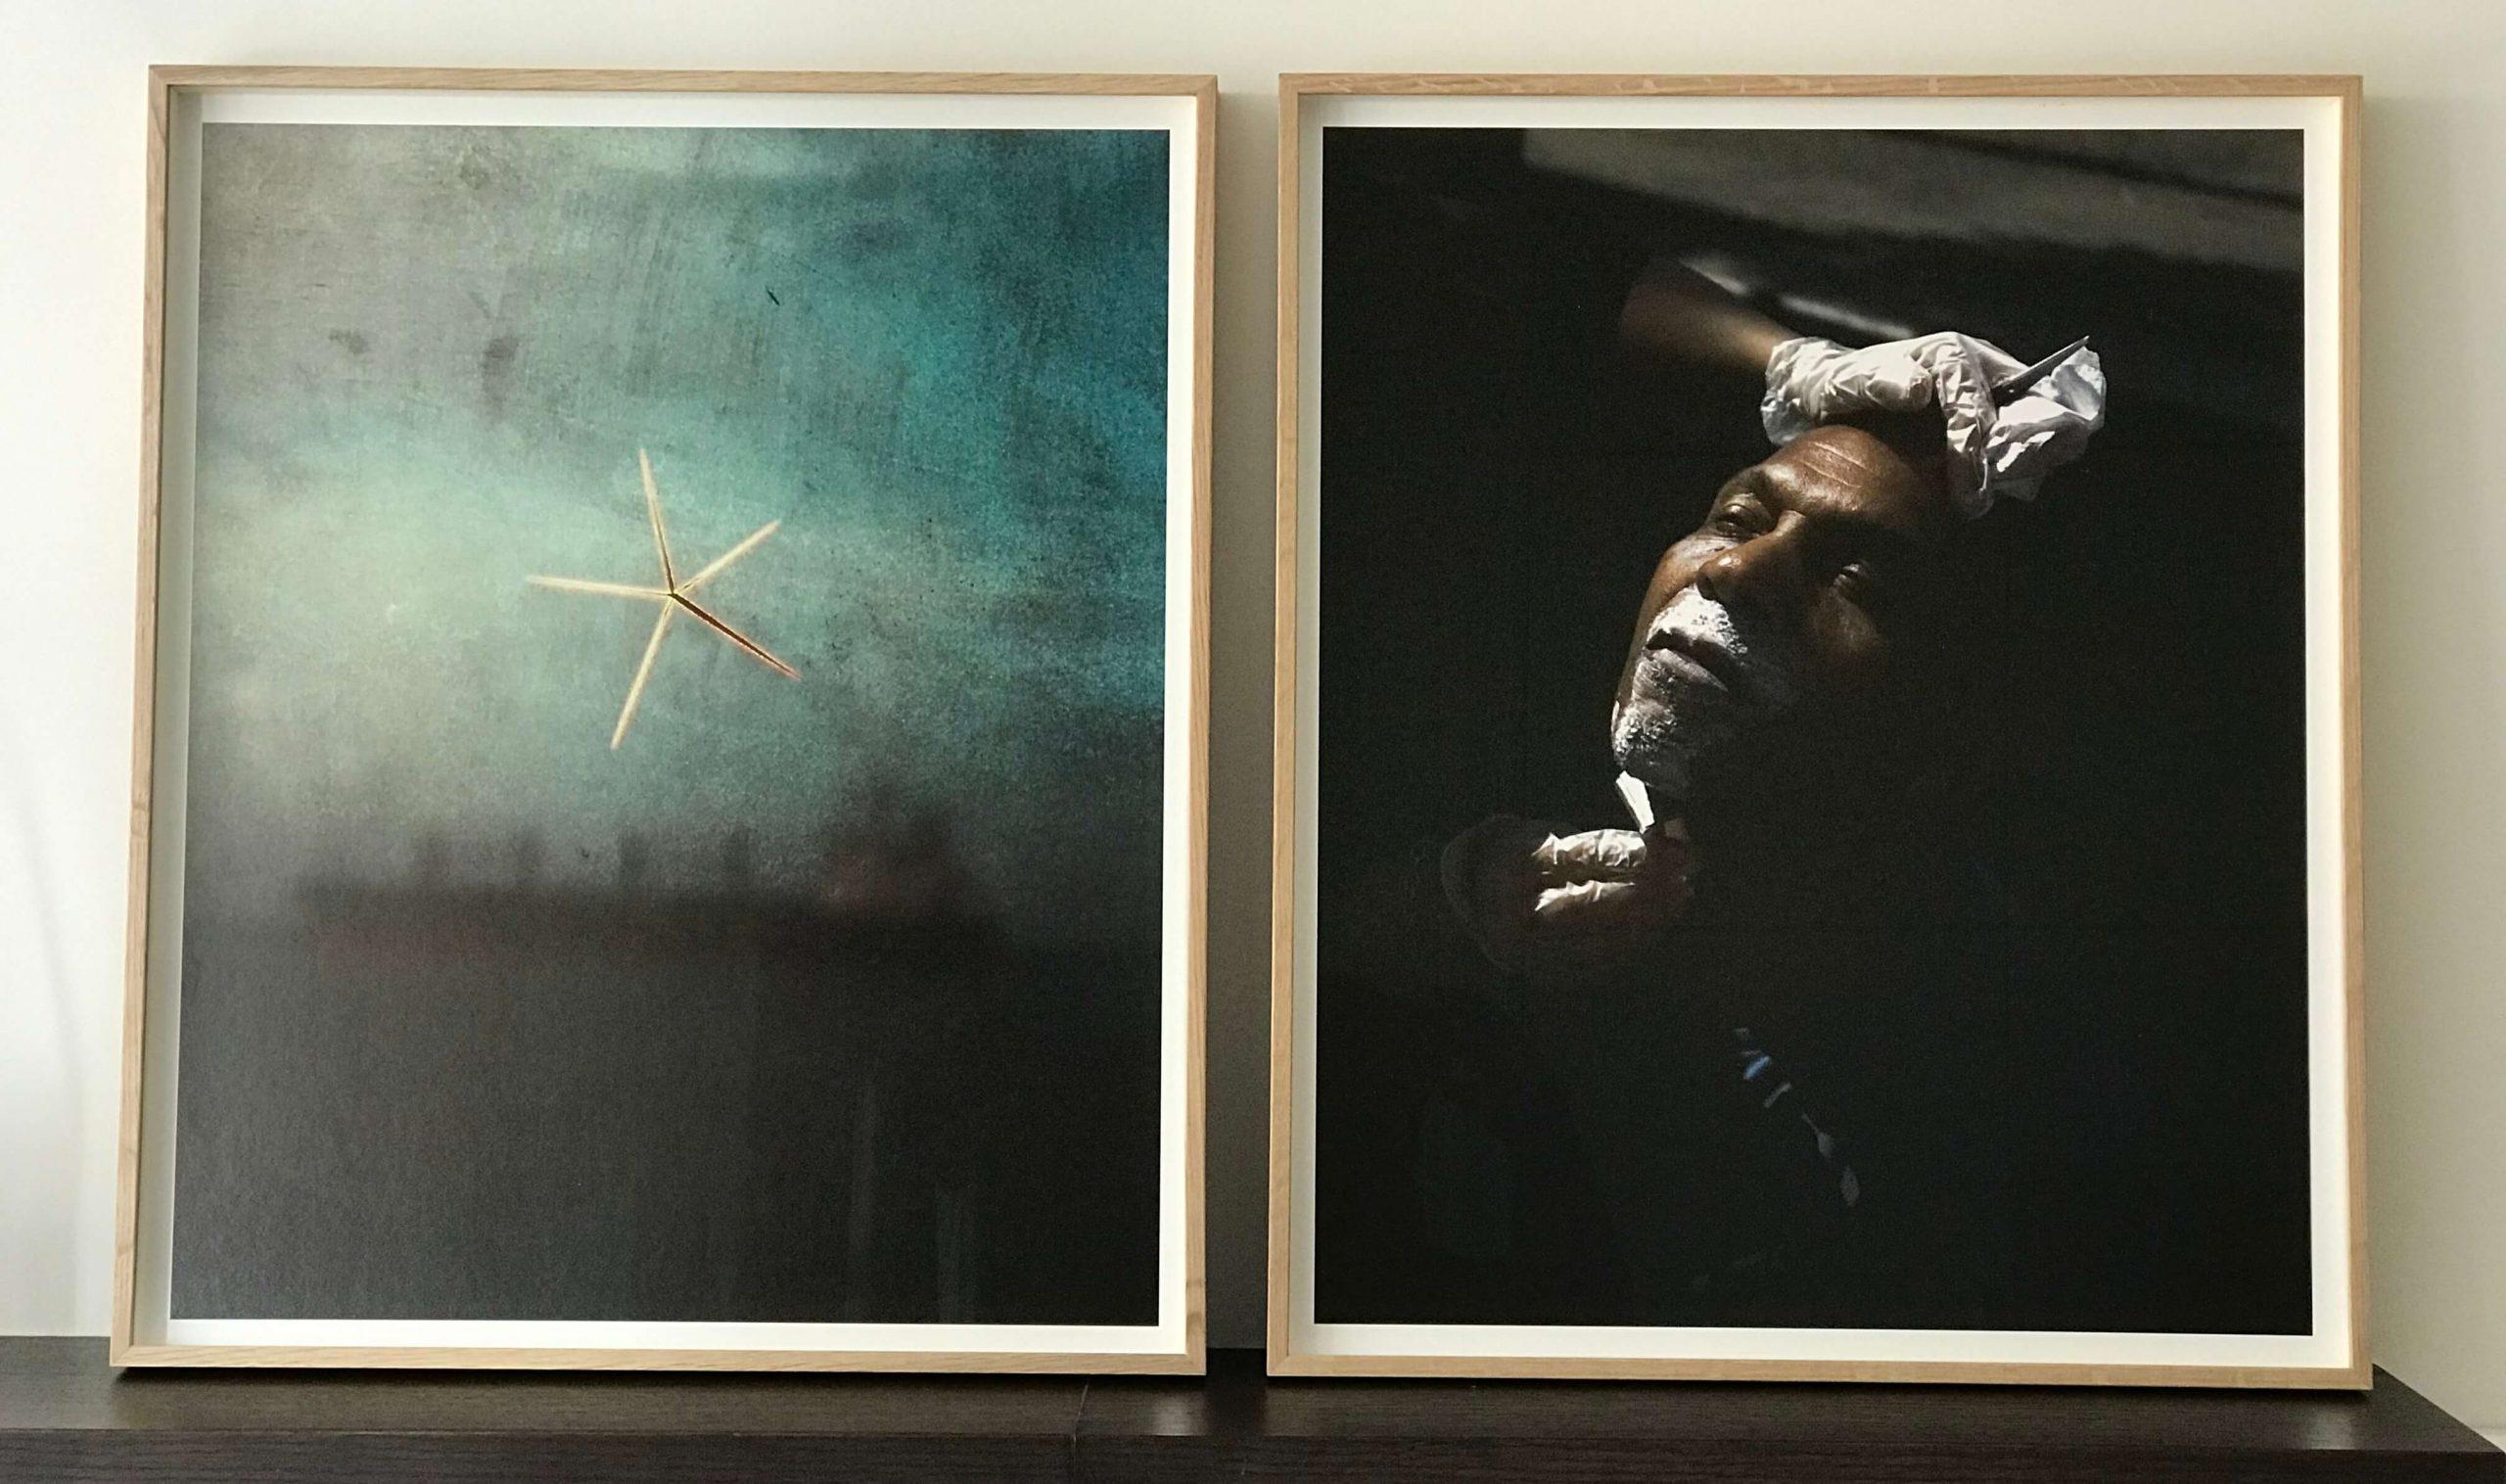 Framed prints from Fordlandia9 by JM Ramirez-Suassi